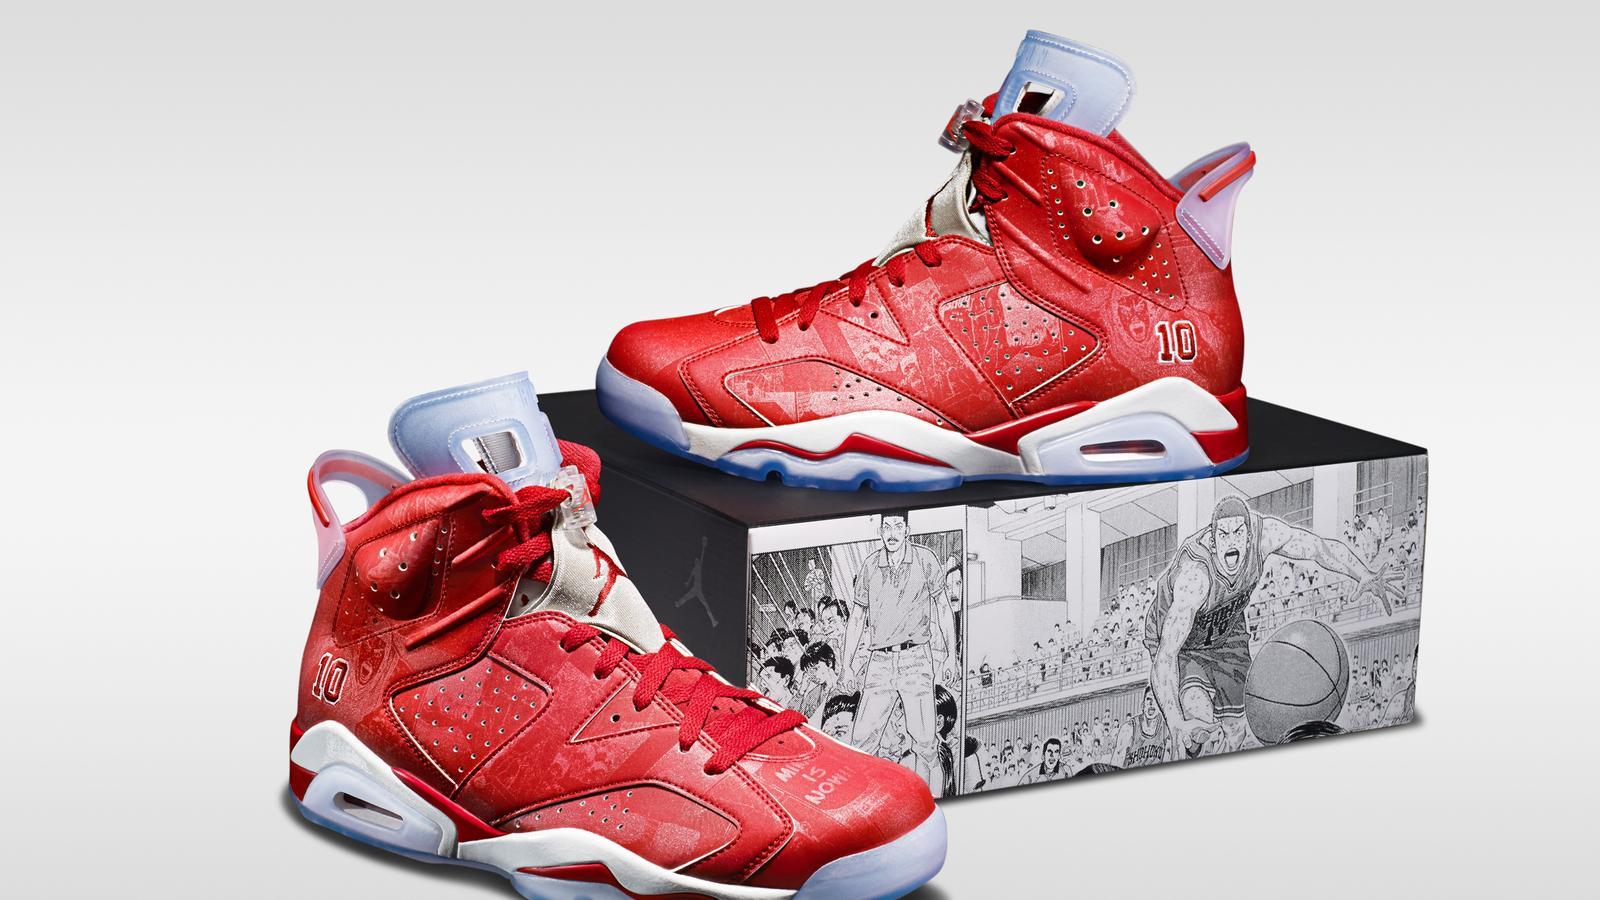 Nike Air Jordan 6 Prix De Slamdunk